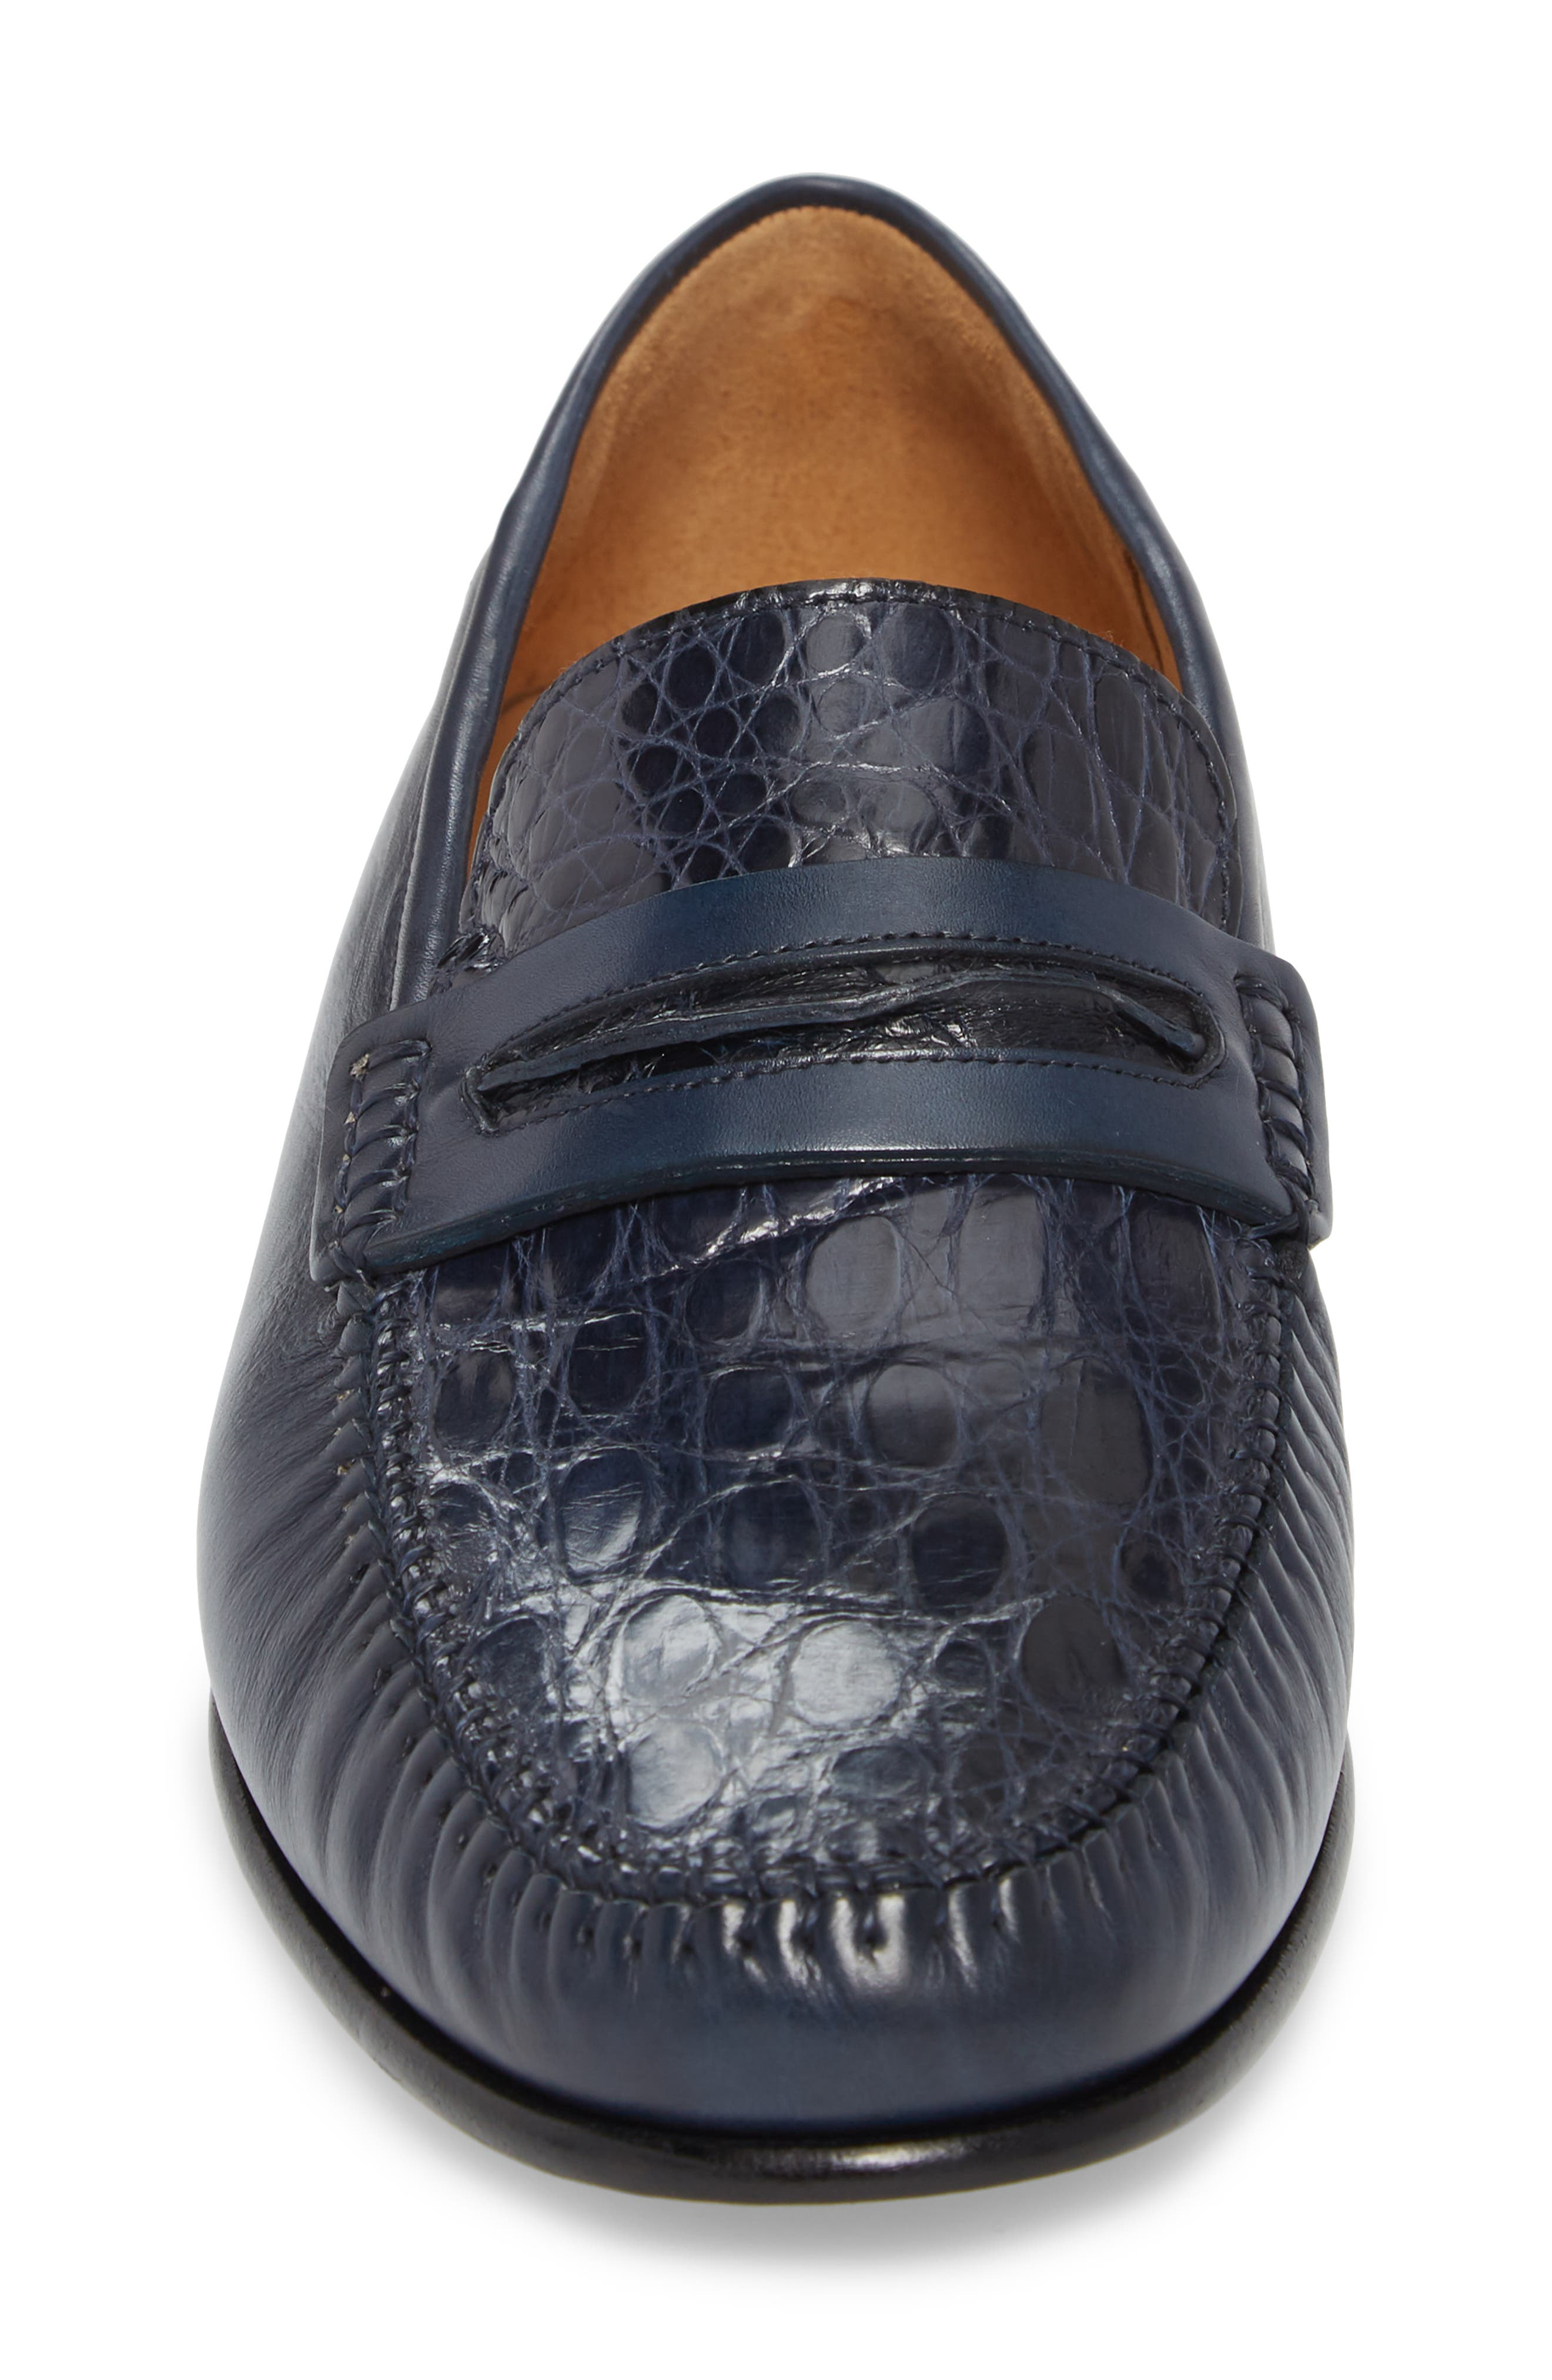 Kronos Moc Toe Penny Loafer,                             Alternate thumbnail 4, color,                             Blue Leather